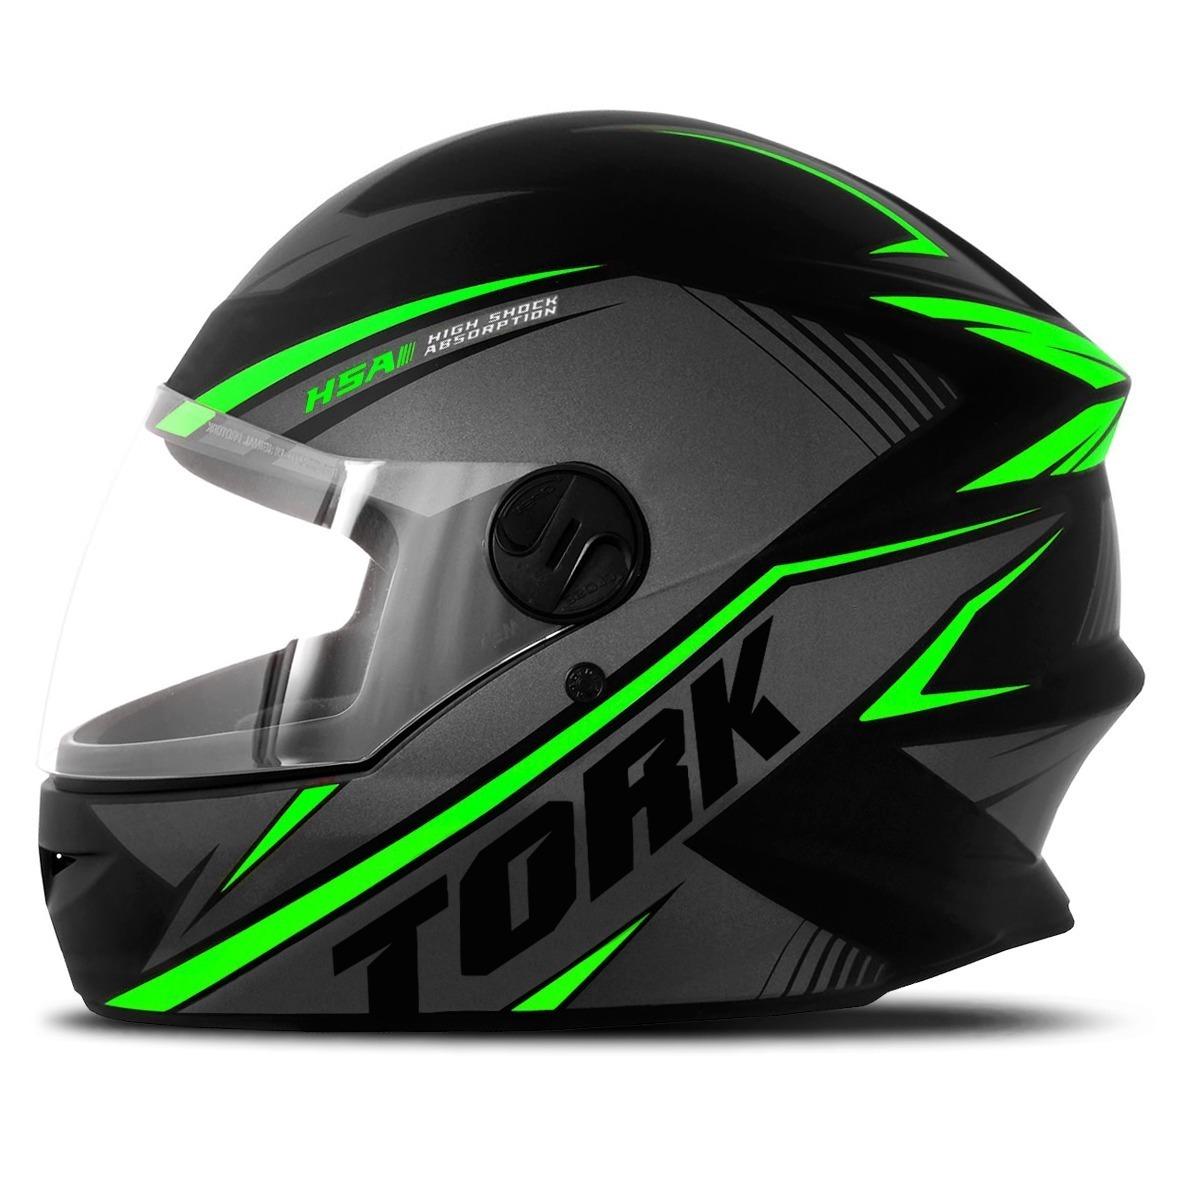 capacete moto new liberty four pro tork r8 fechado verde. Carregando zoom. b95f8bc0a2